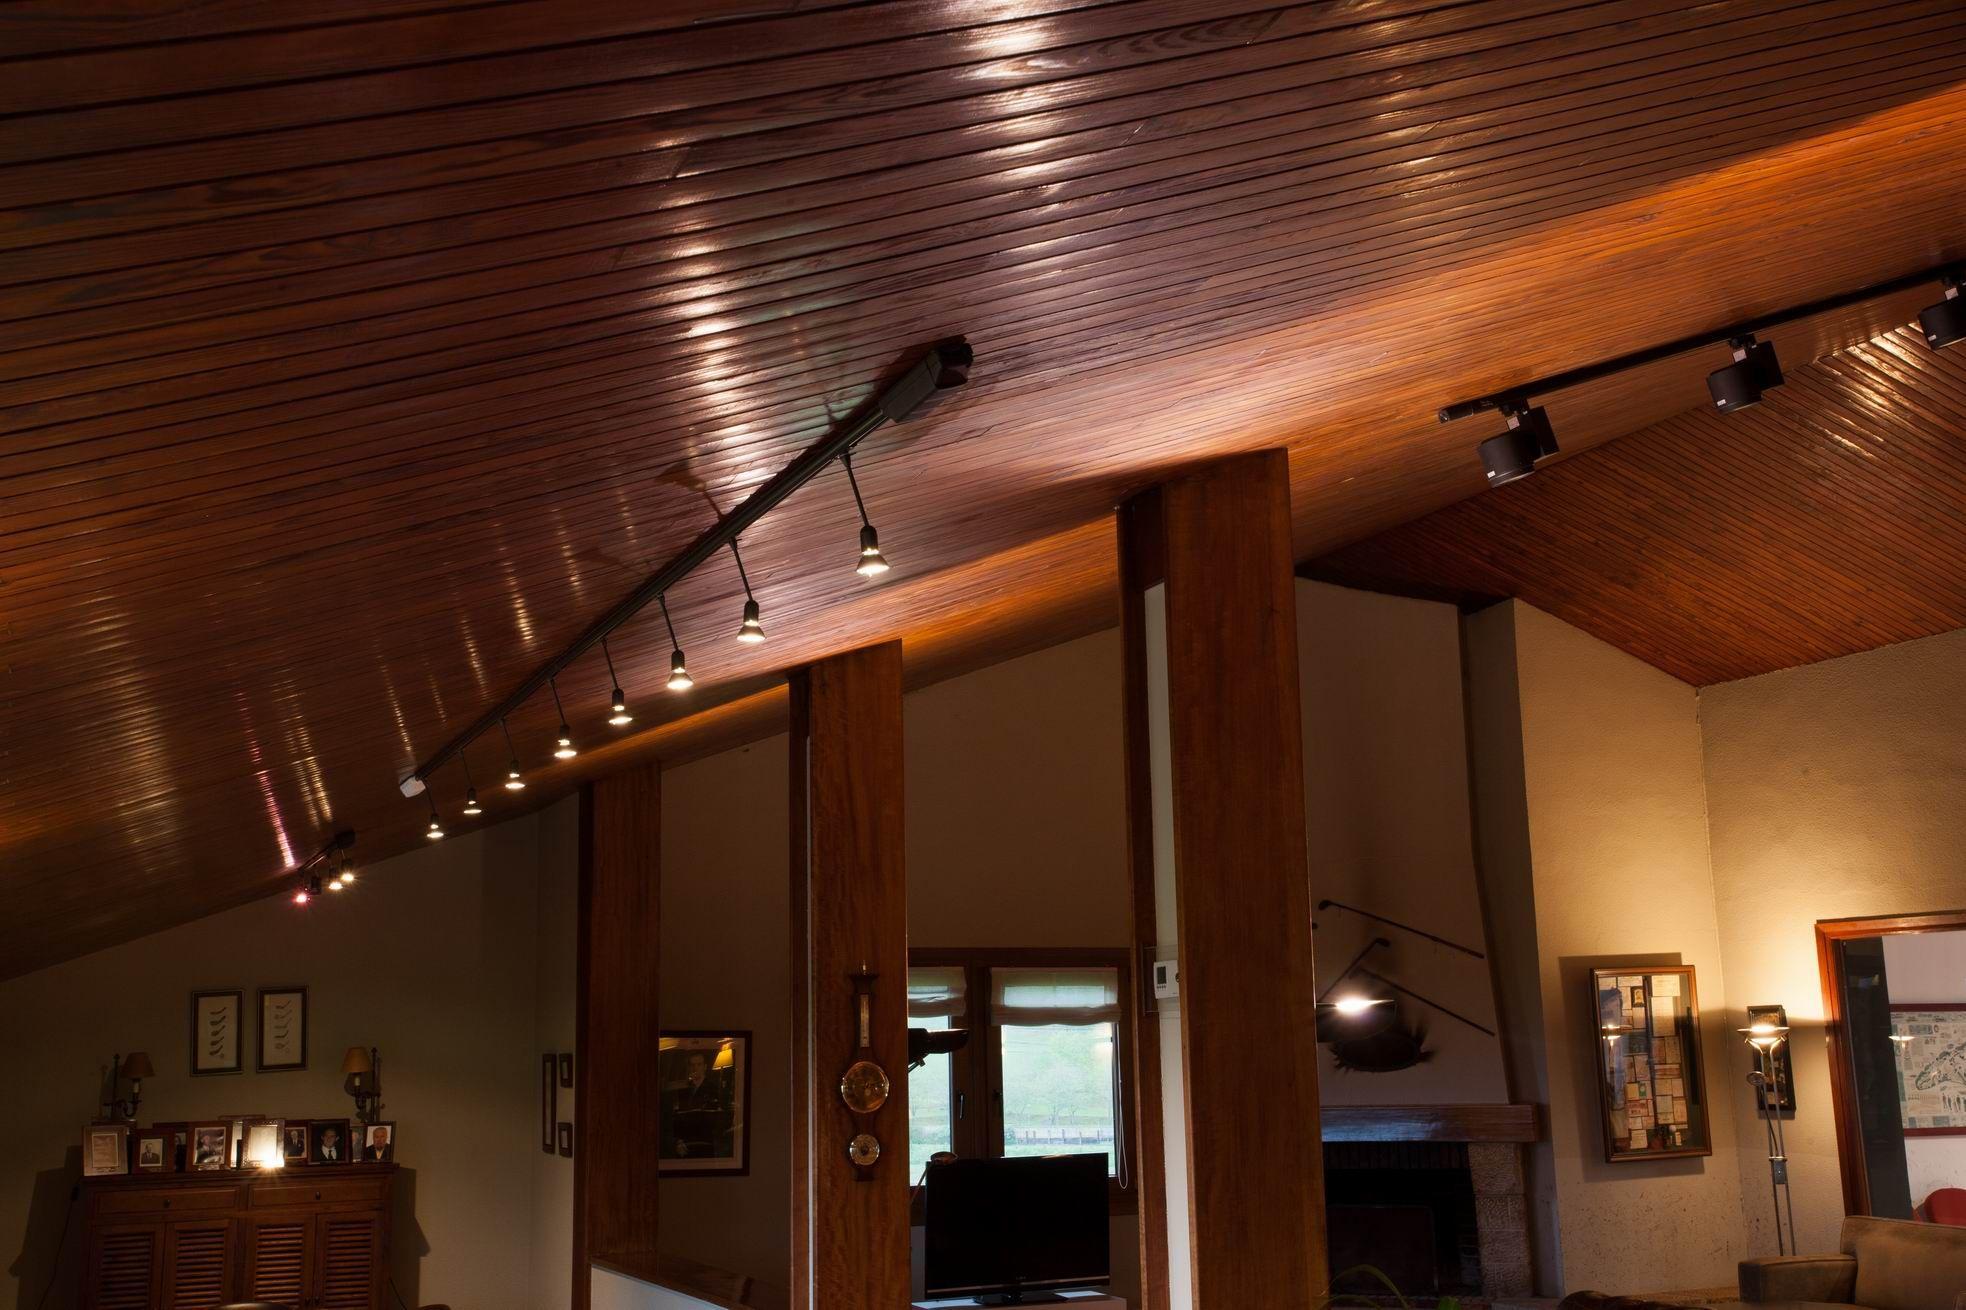 Proyecto de iluminación Club de Golf. #iluminacion #taraluxiluminacion